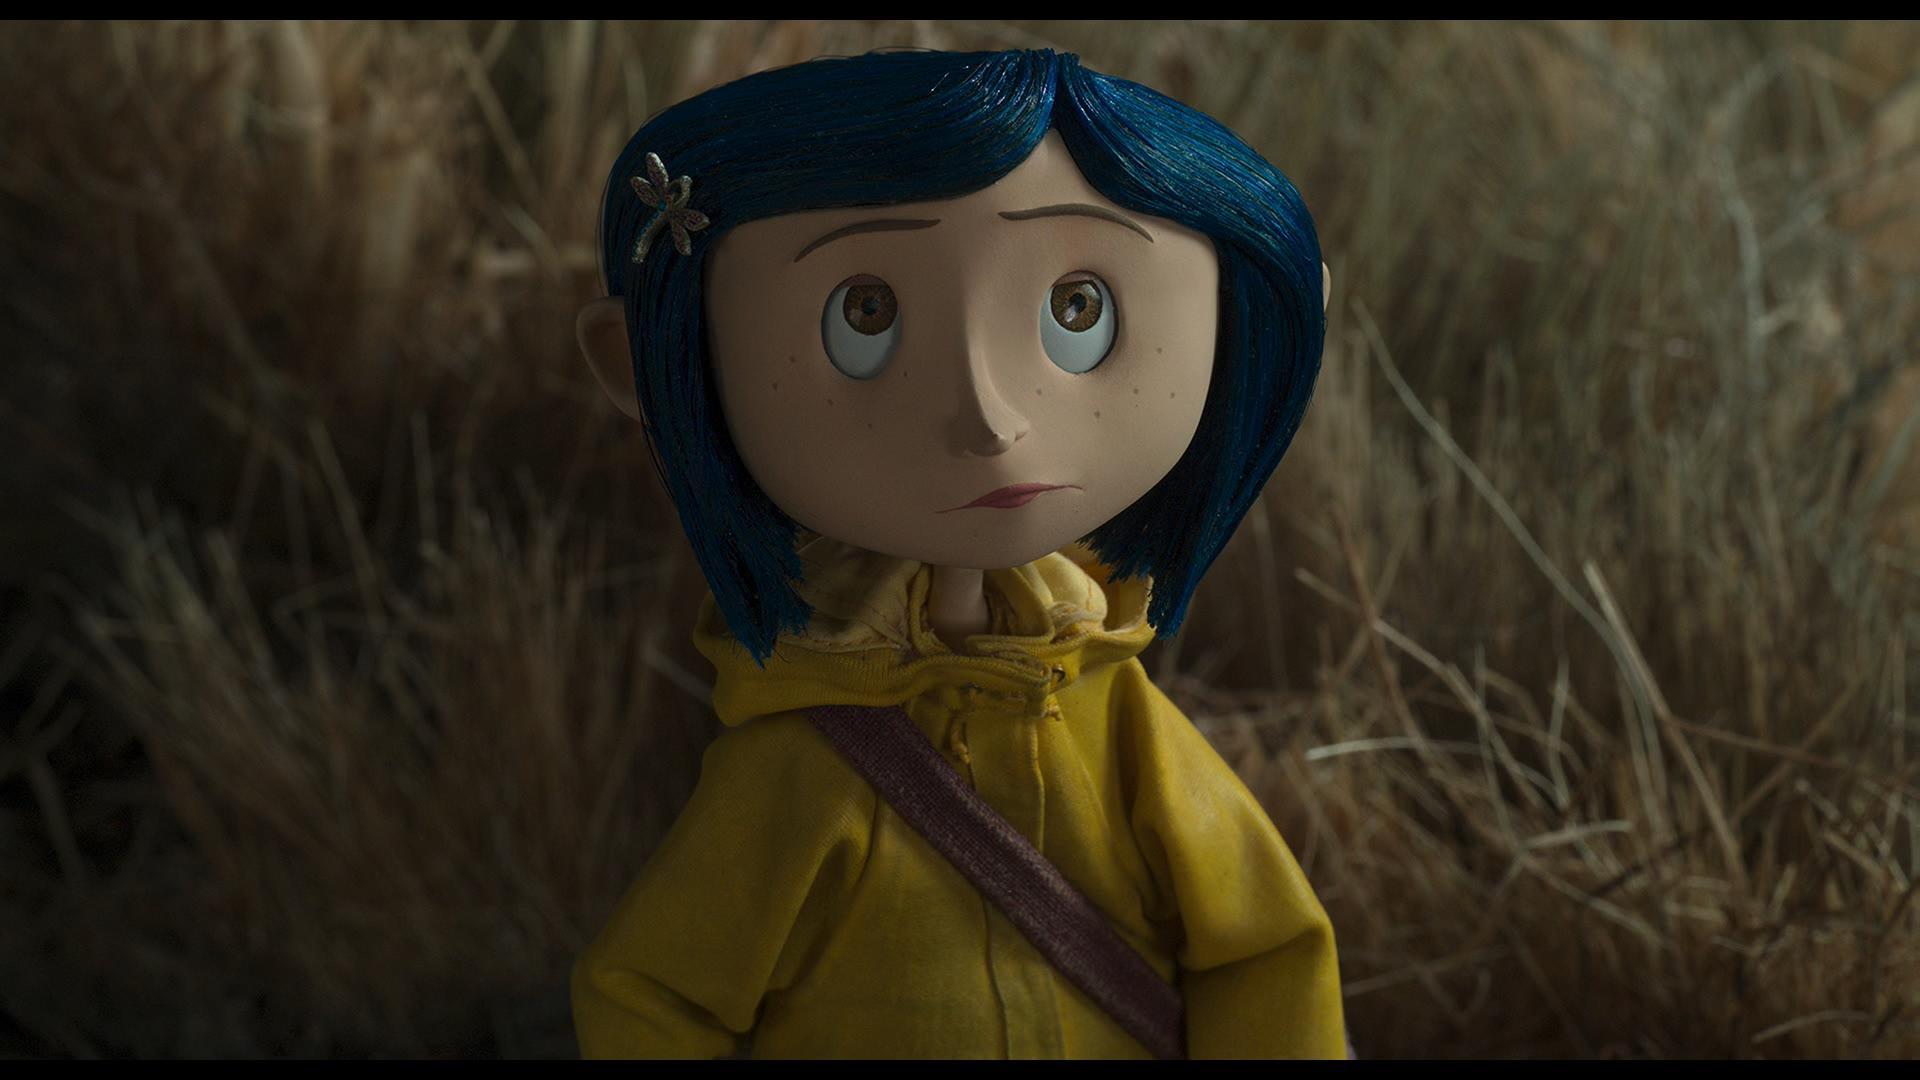 Hows There Coraline Movie Coraline Coraline Jones